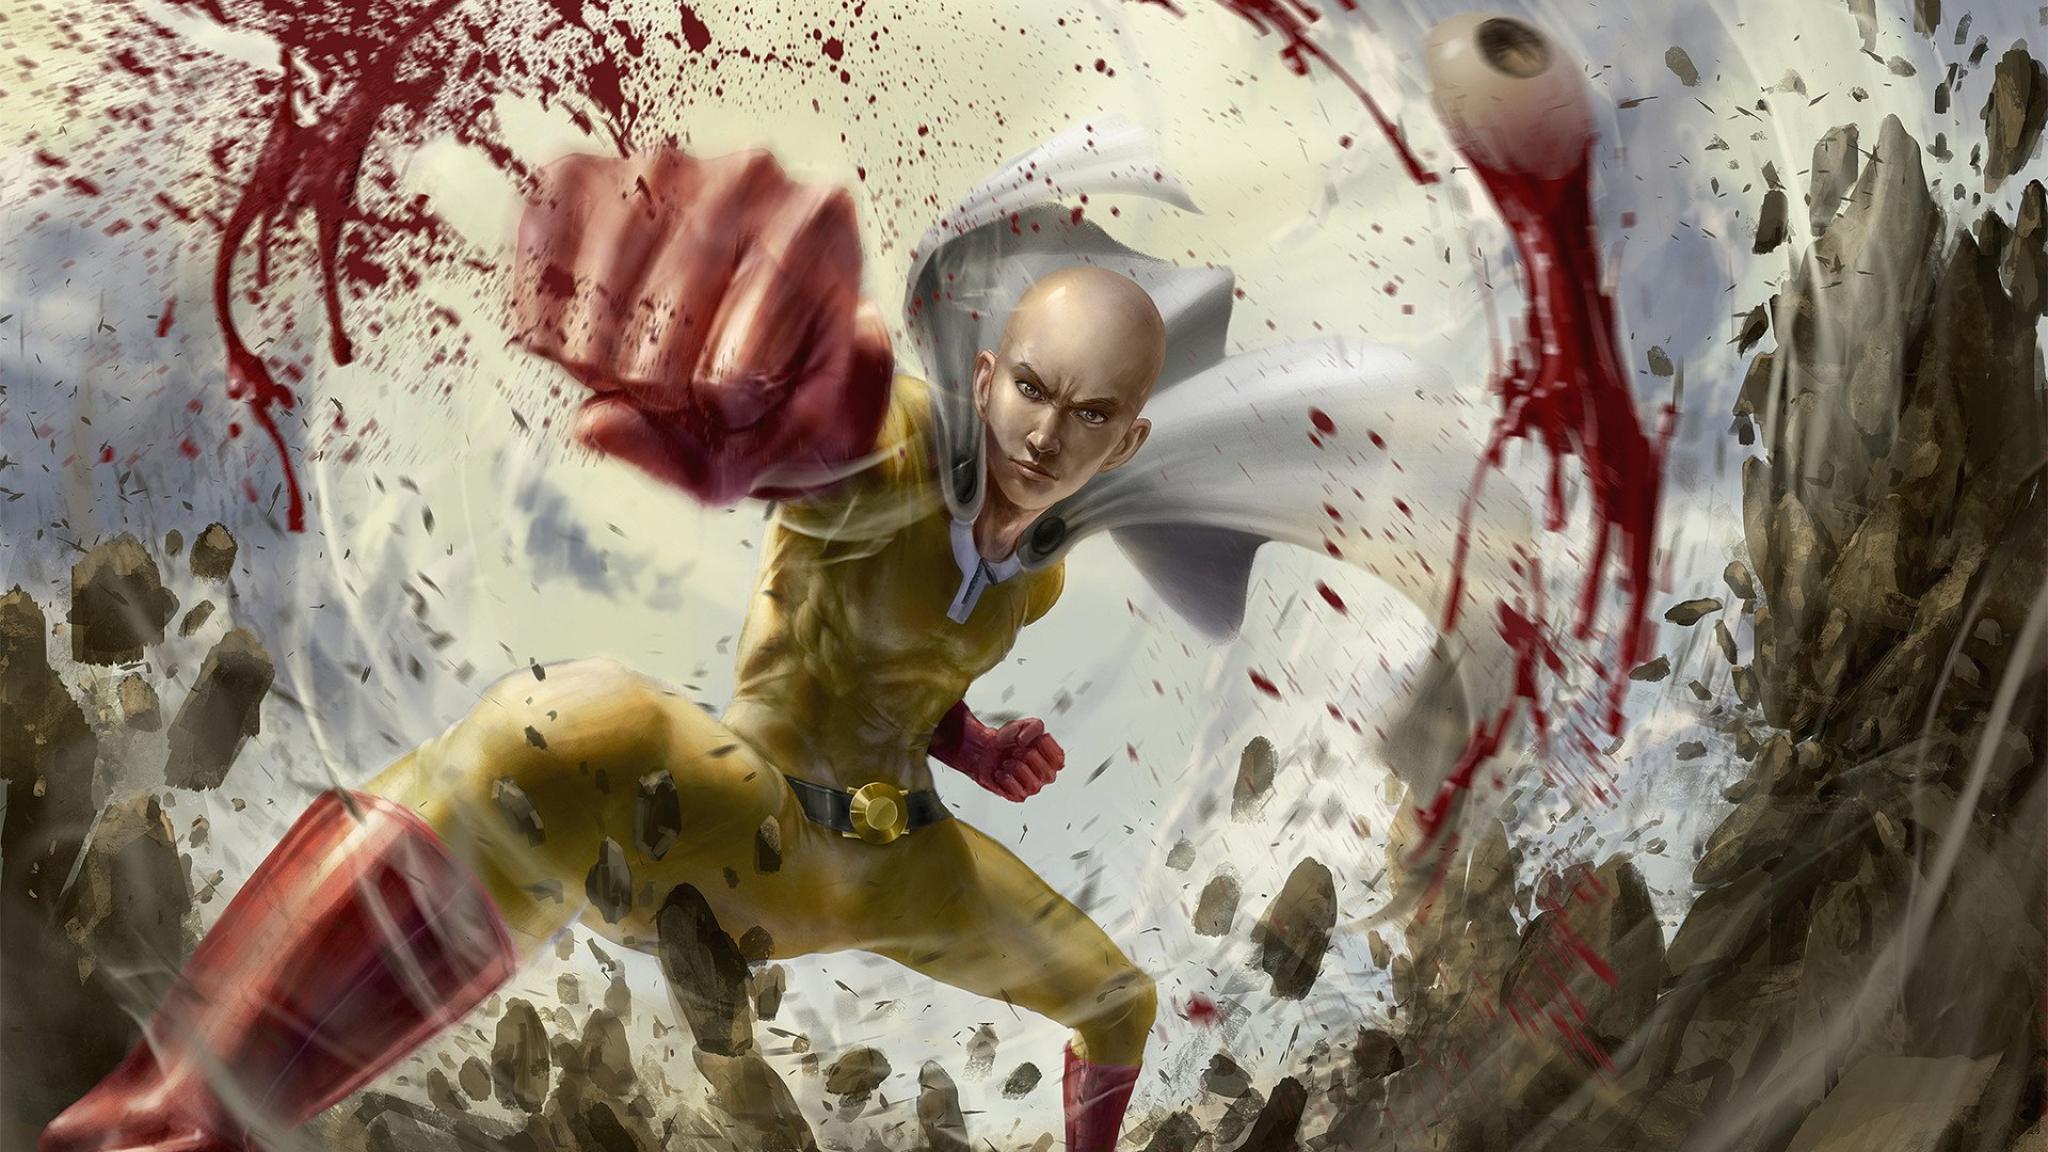 2048x1152 Saitama Cool One Punch Man 2048x1152 Resolution ...